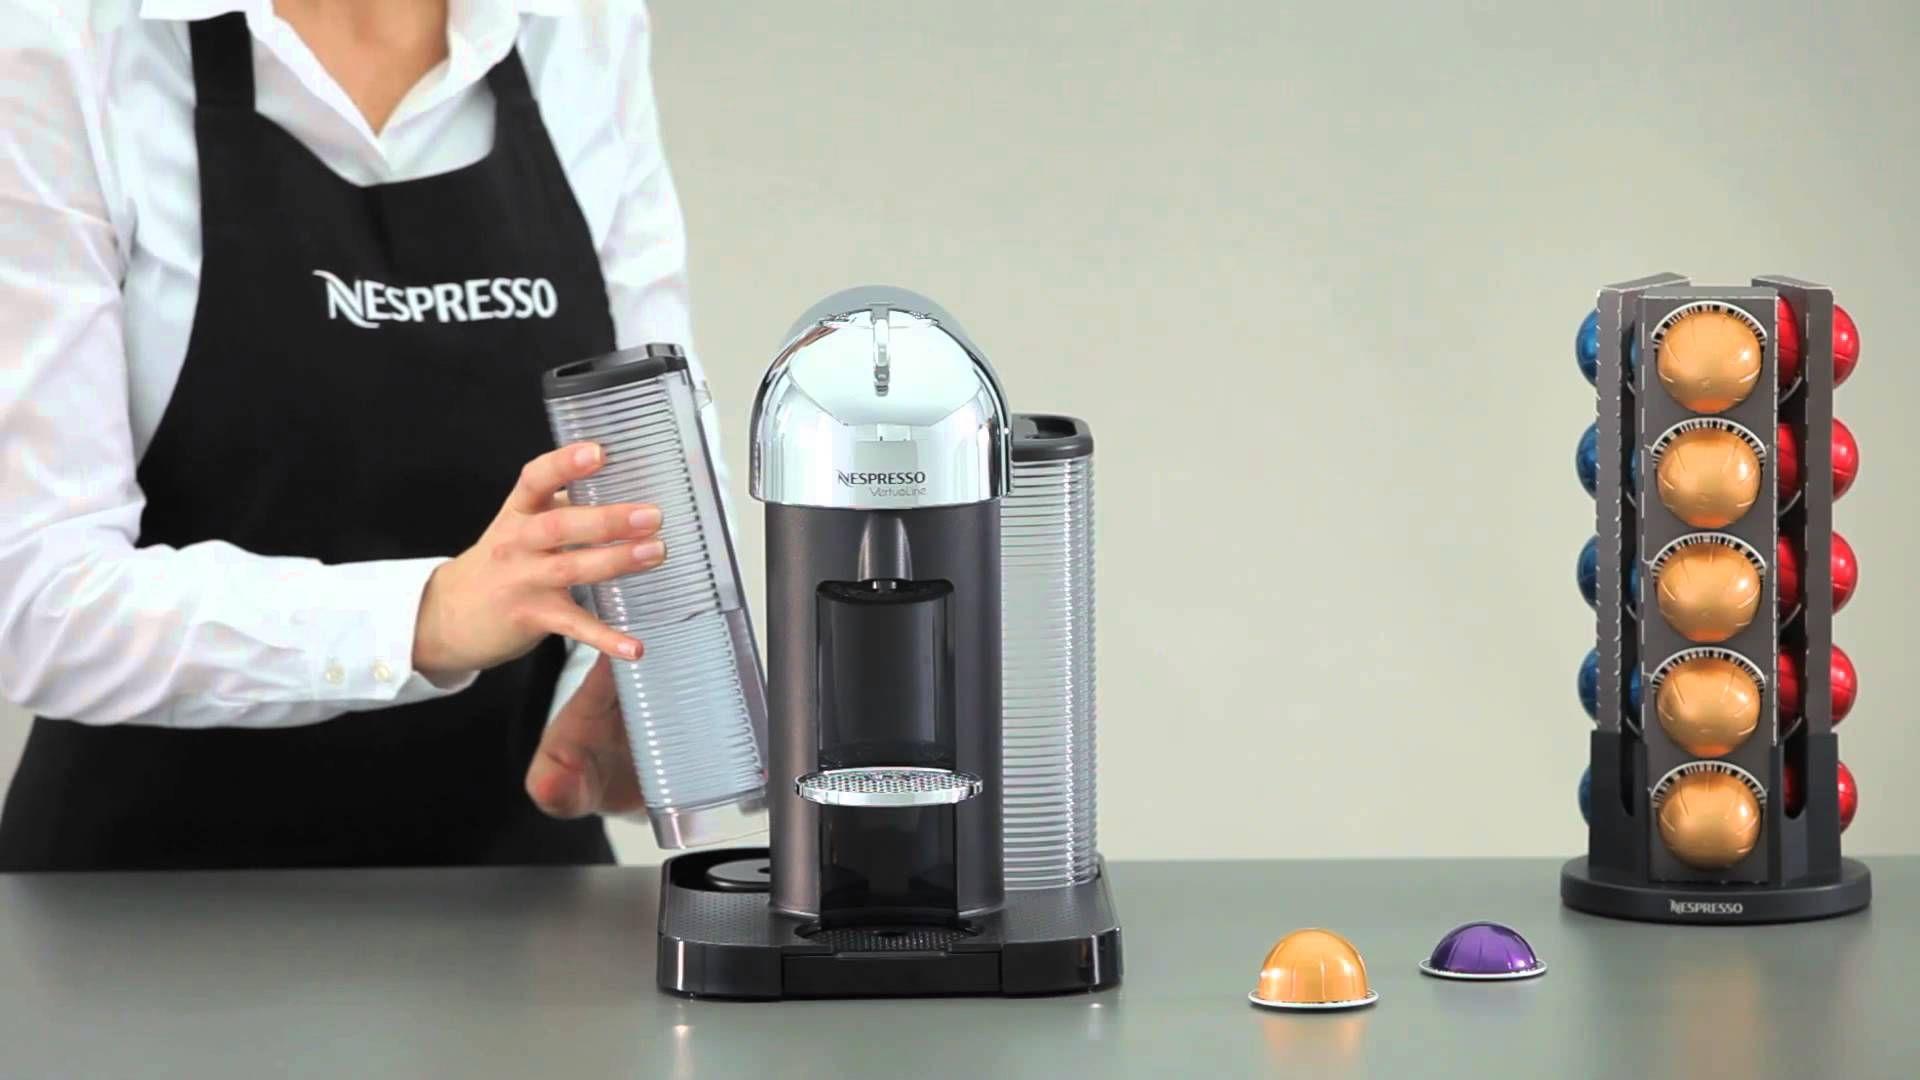 How To Descale Your Vertuoline Machine Nespresso Nespresso Descaling Nespresso Coffee Maker